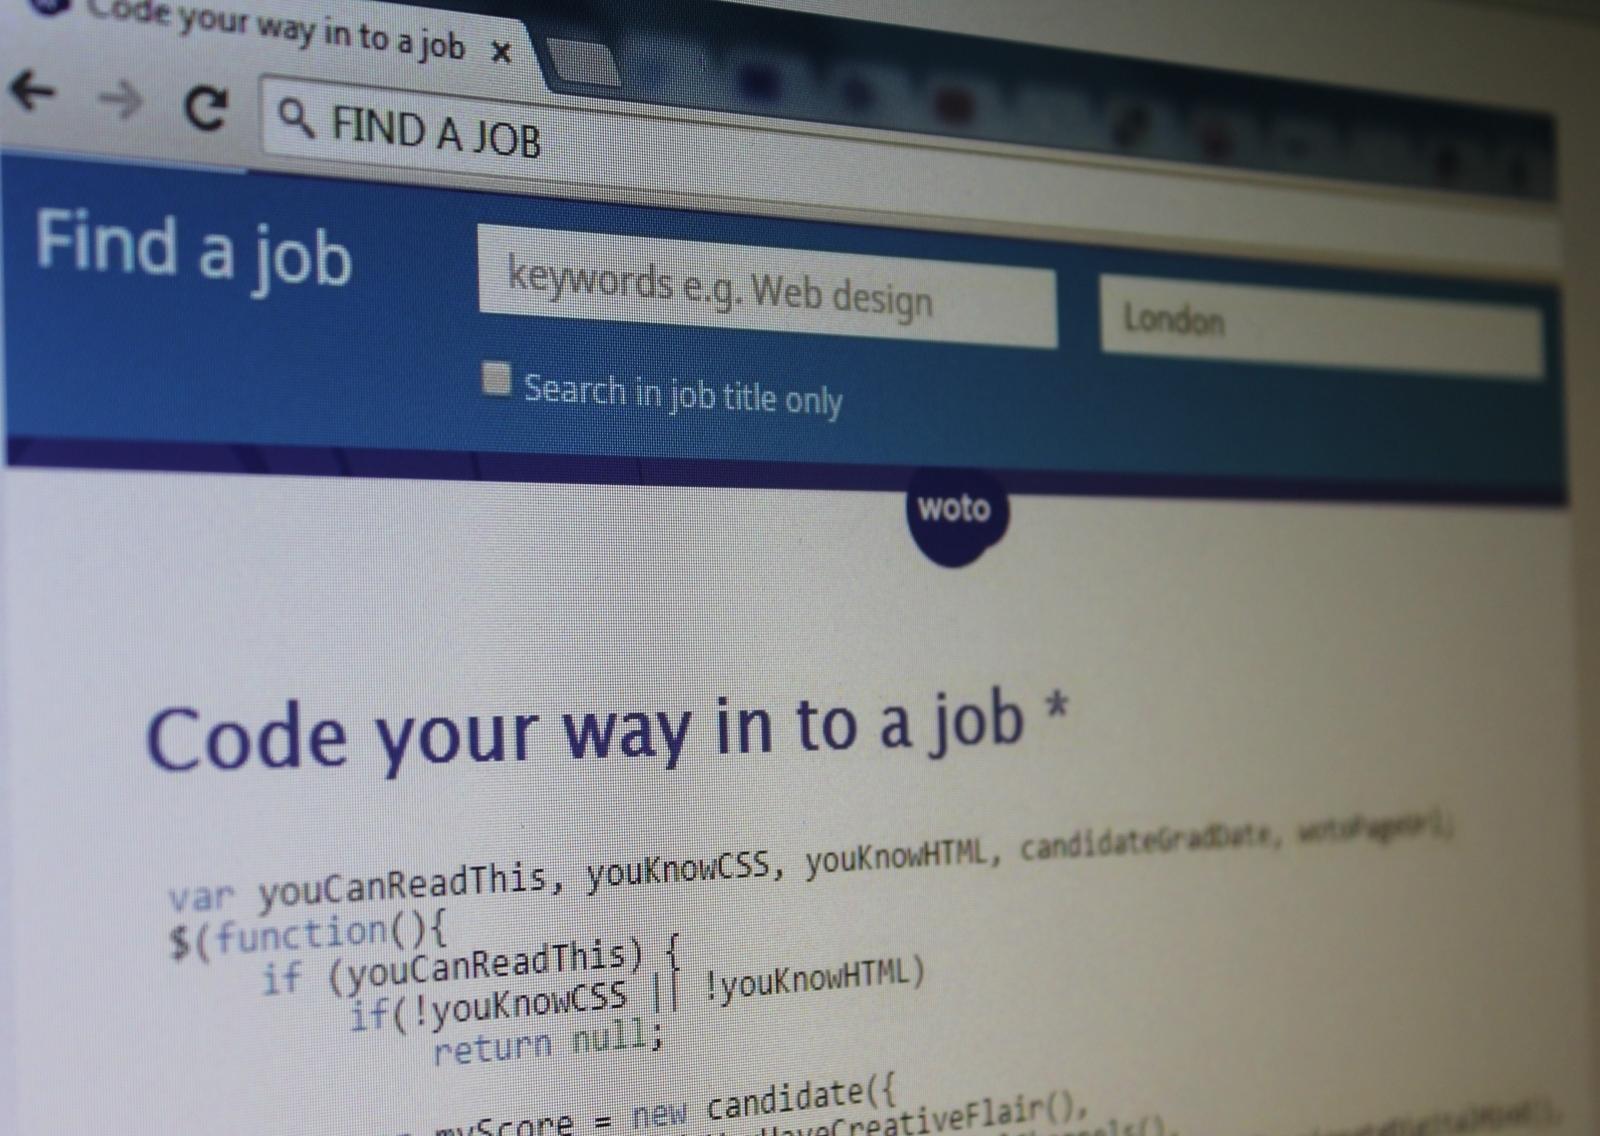 coding job advert woto